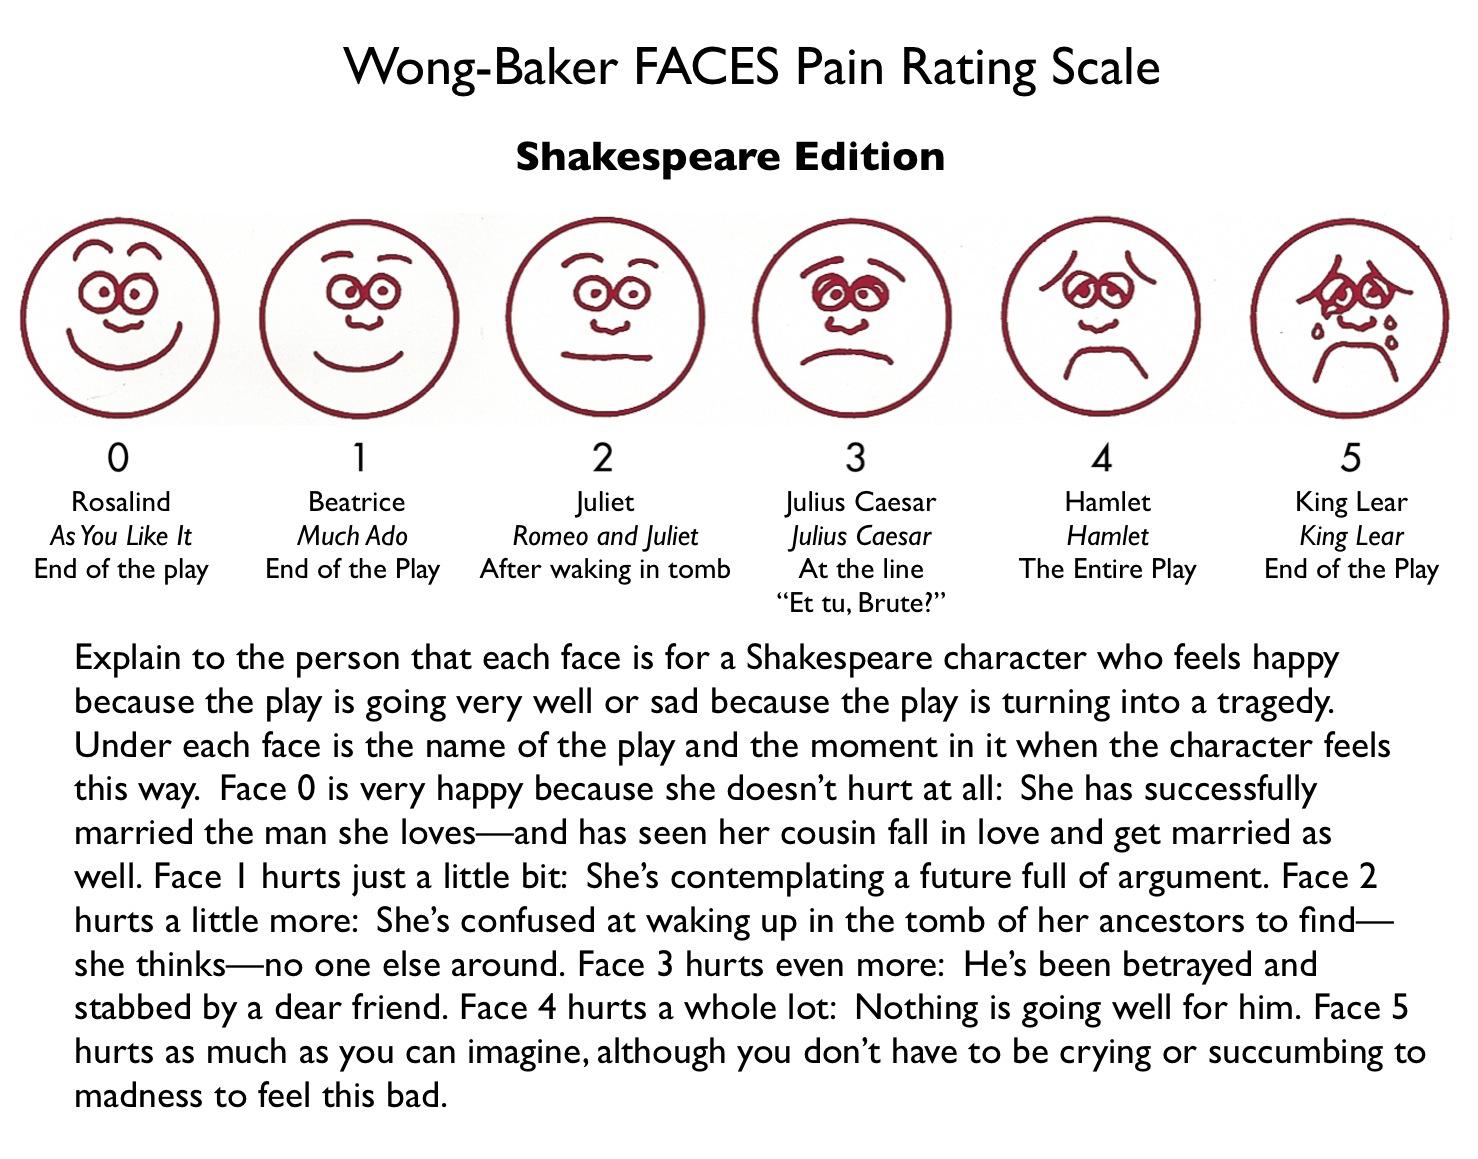 photograph regarding Wong Baker Pain Scale Printable titled Printable Wong Baker Suffering Scale